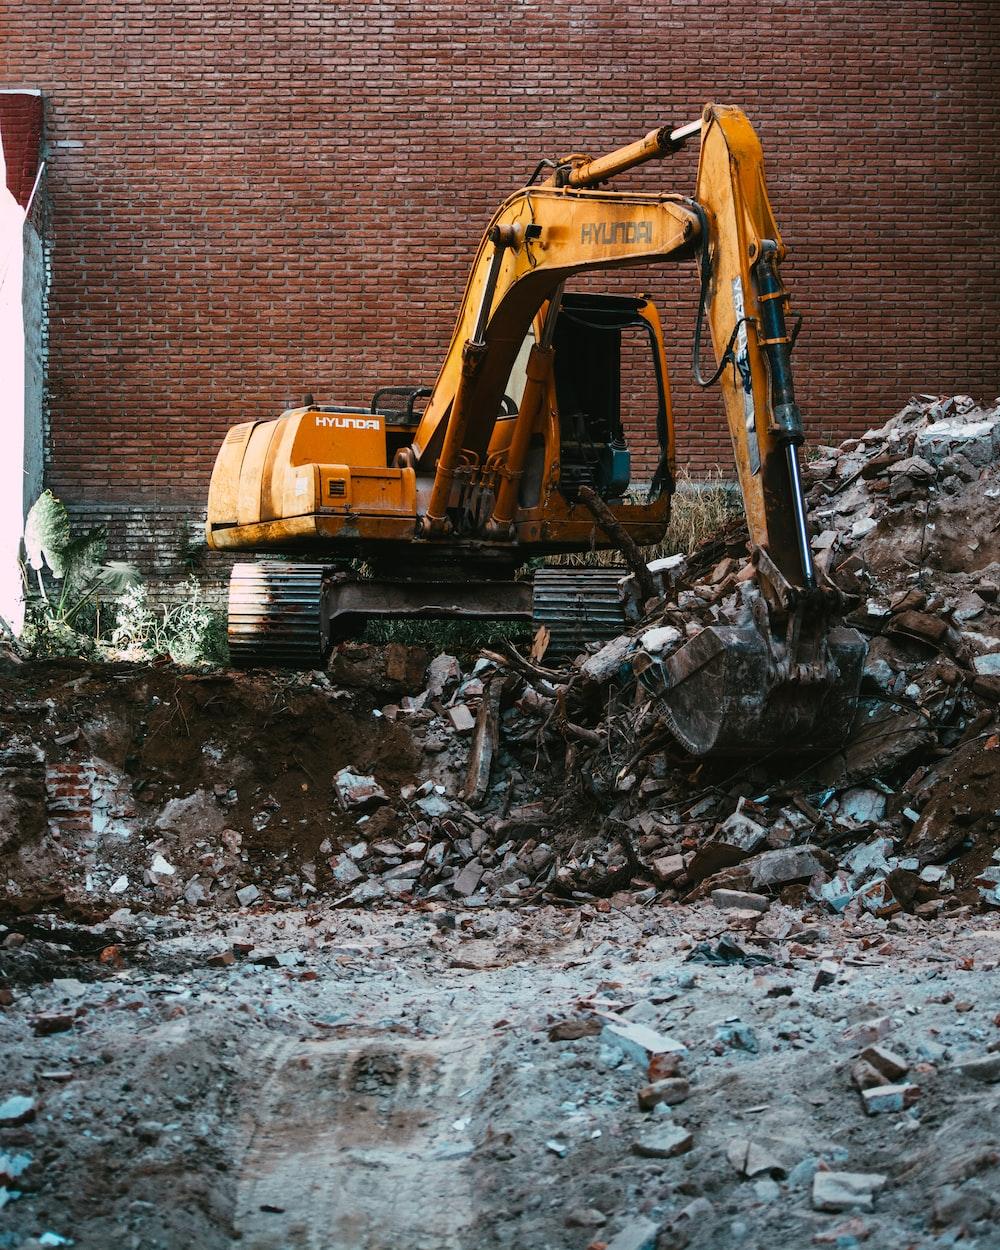 yellow excavator beside brown brick wall